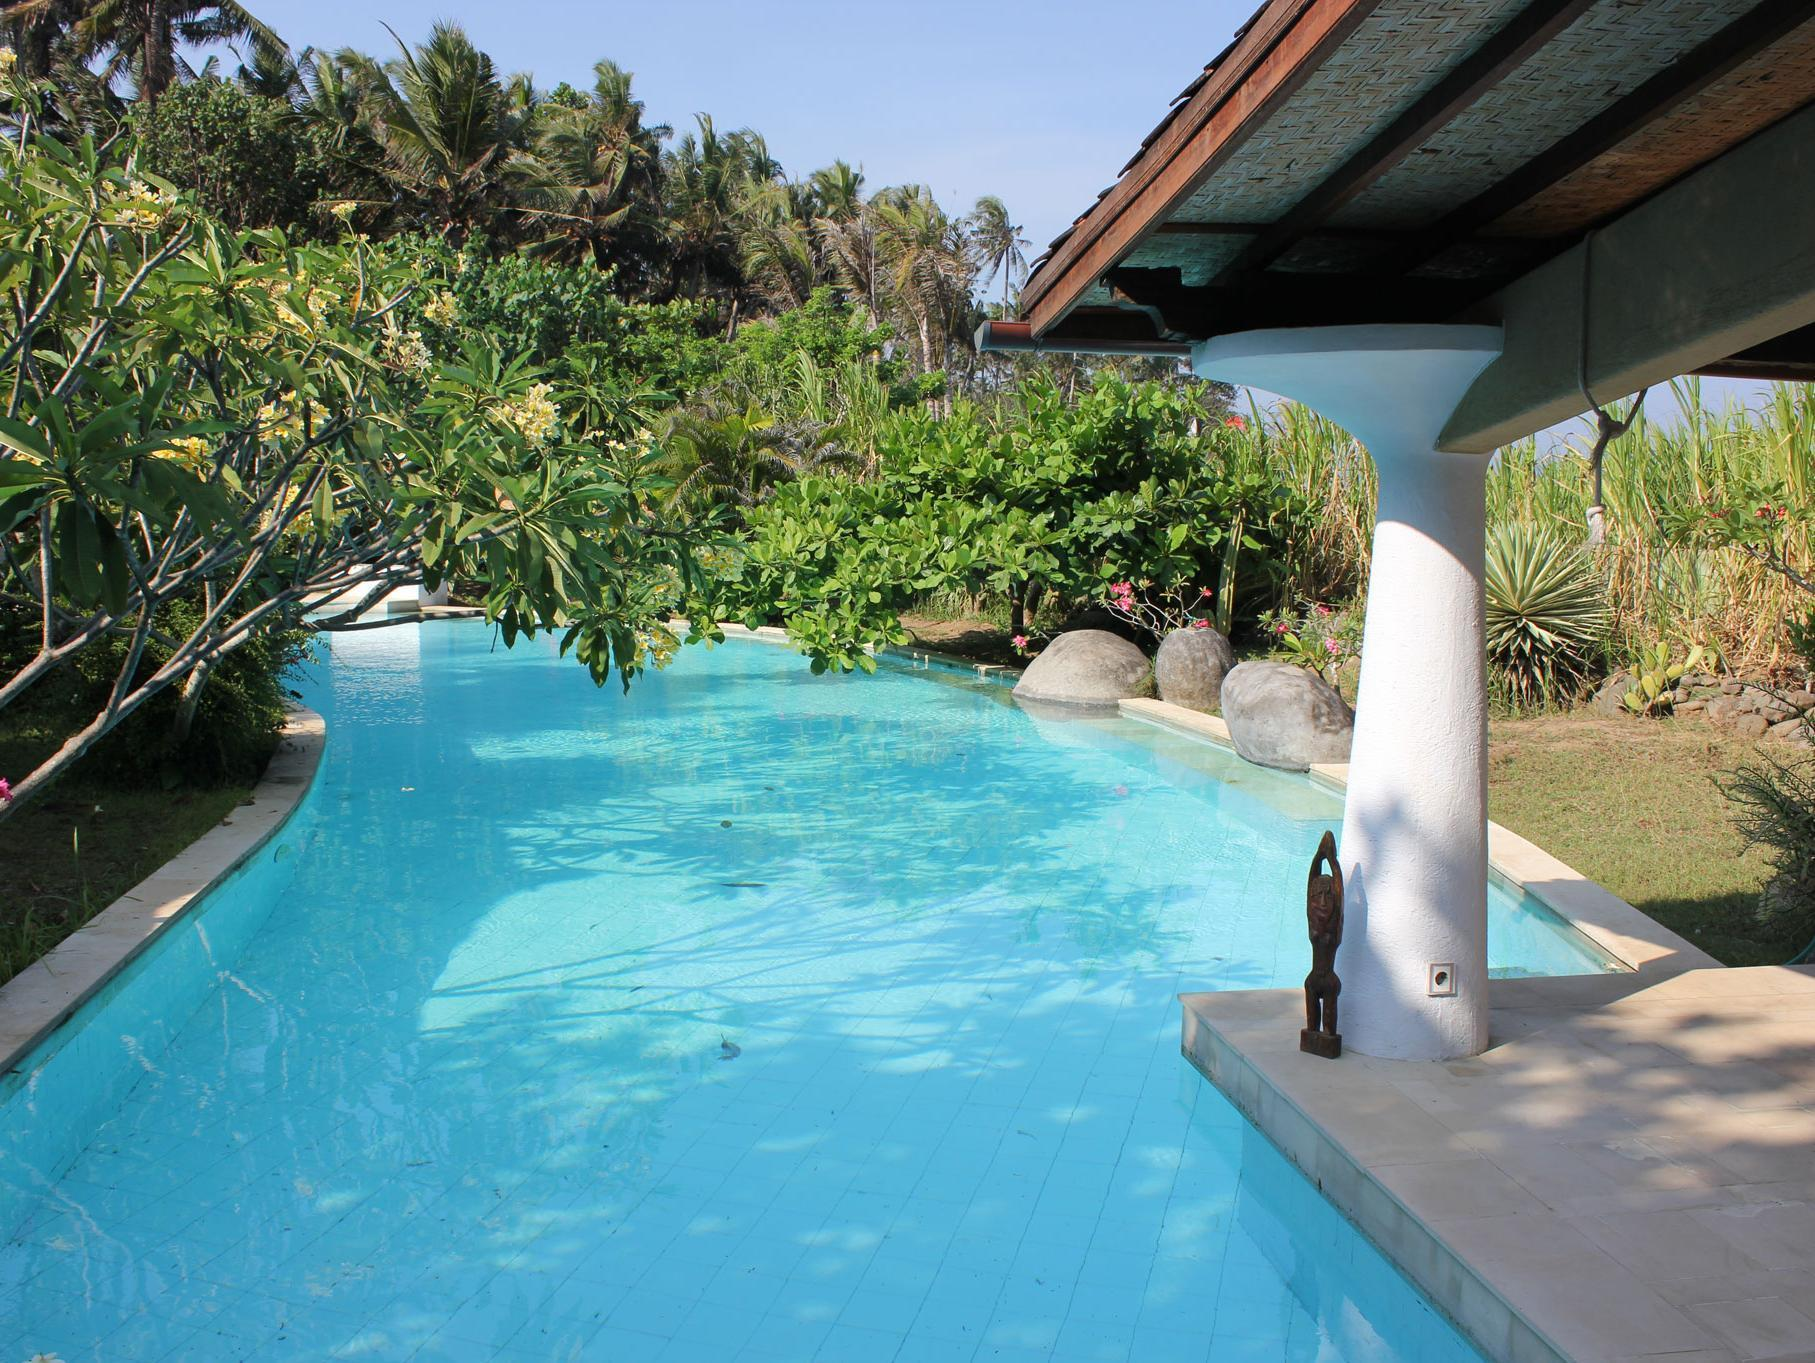 Bali Villa MikelAnjelo ホテル詳細